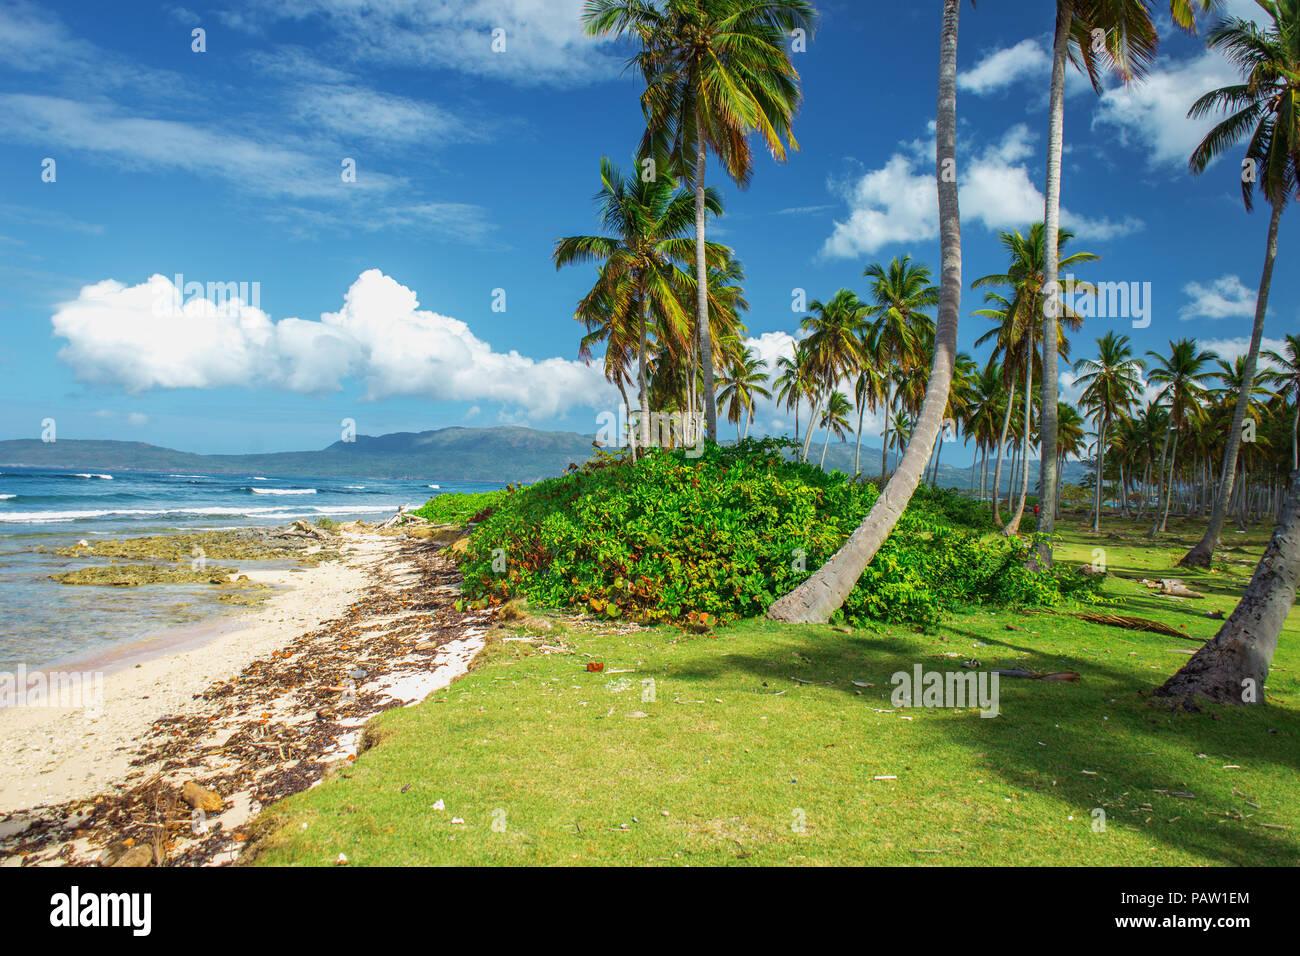 stunning picturesque scenic beautiful Caribbean landscape, Dominican Republic. Sea, palms, blue sky - Stock Image